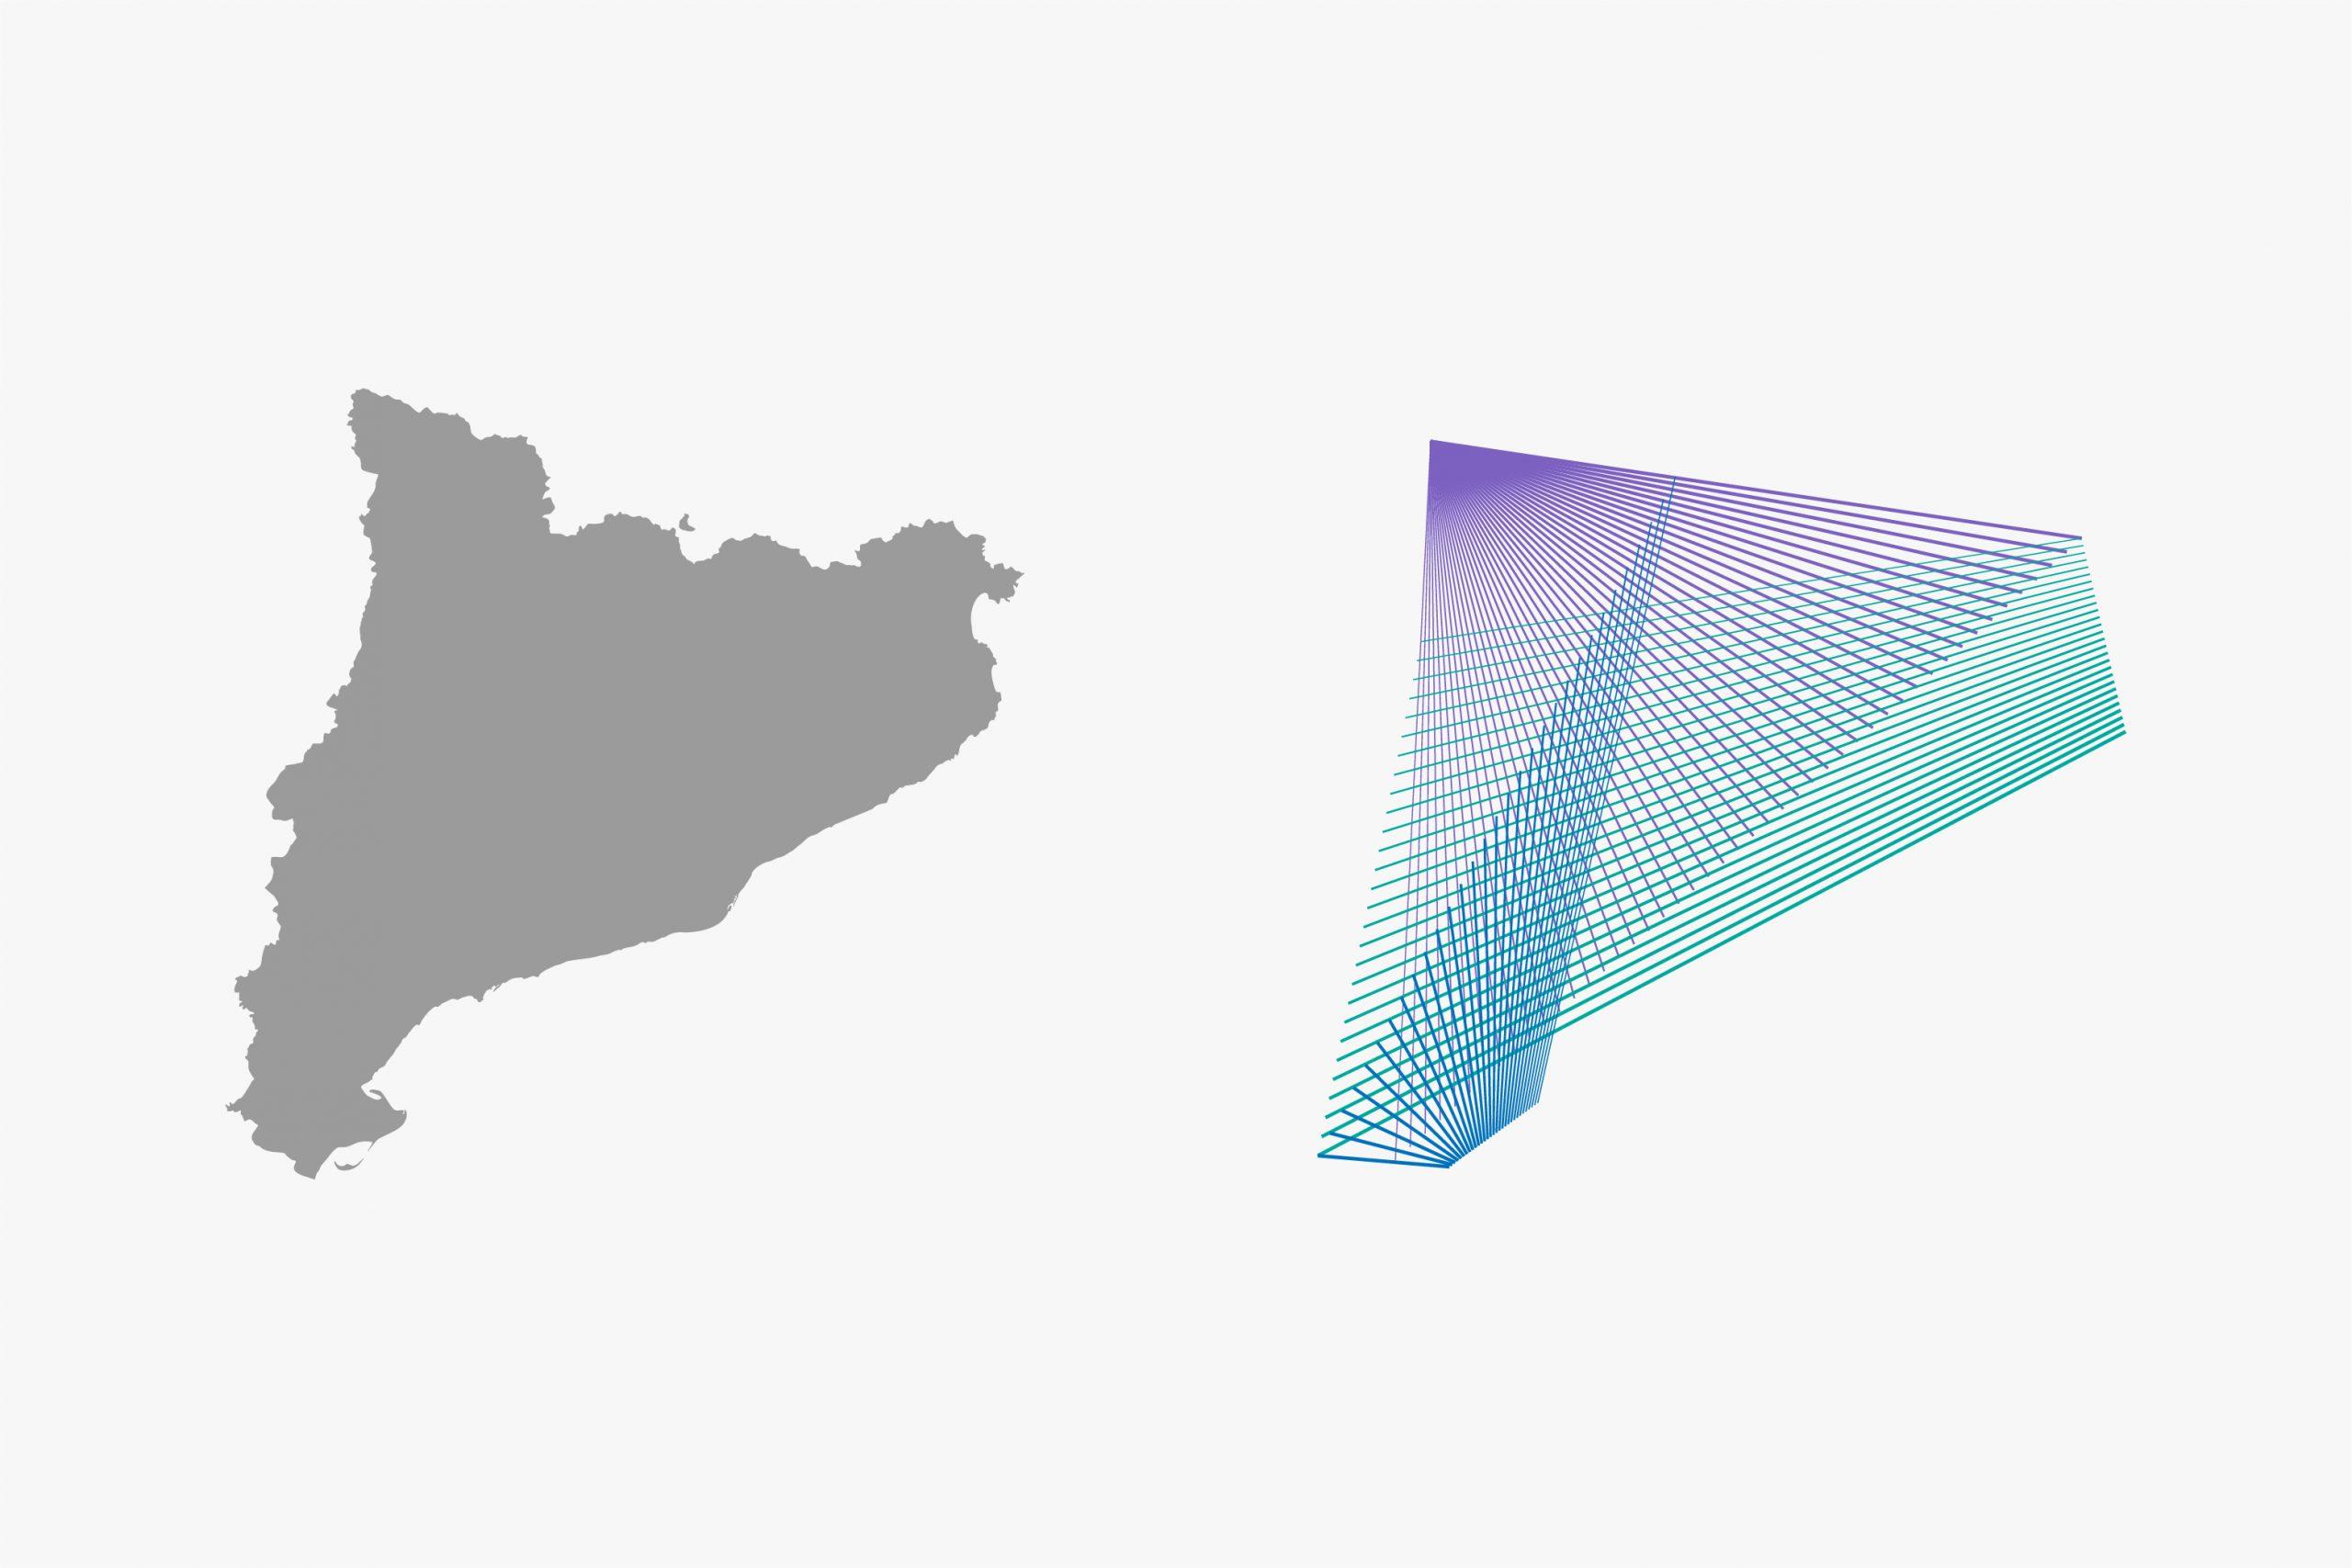 Bitflow-studio-quantumcat-identity-design-logo-research-network-2